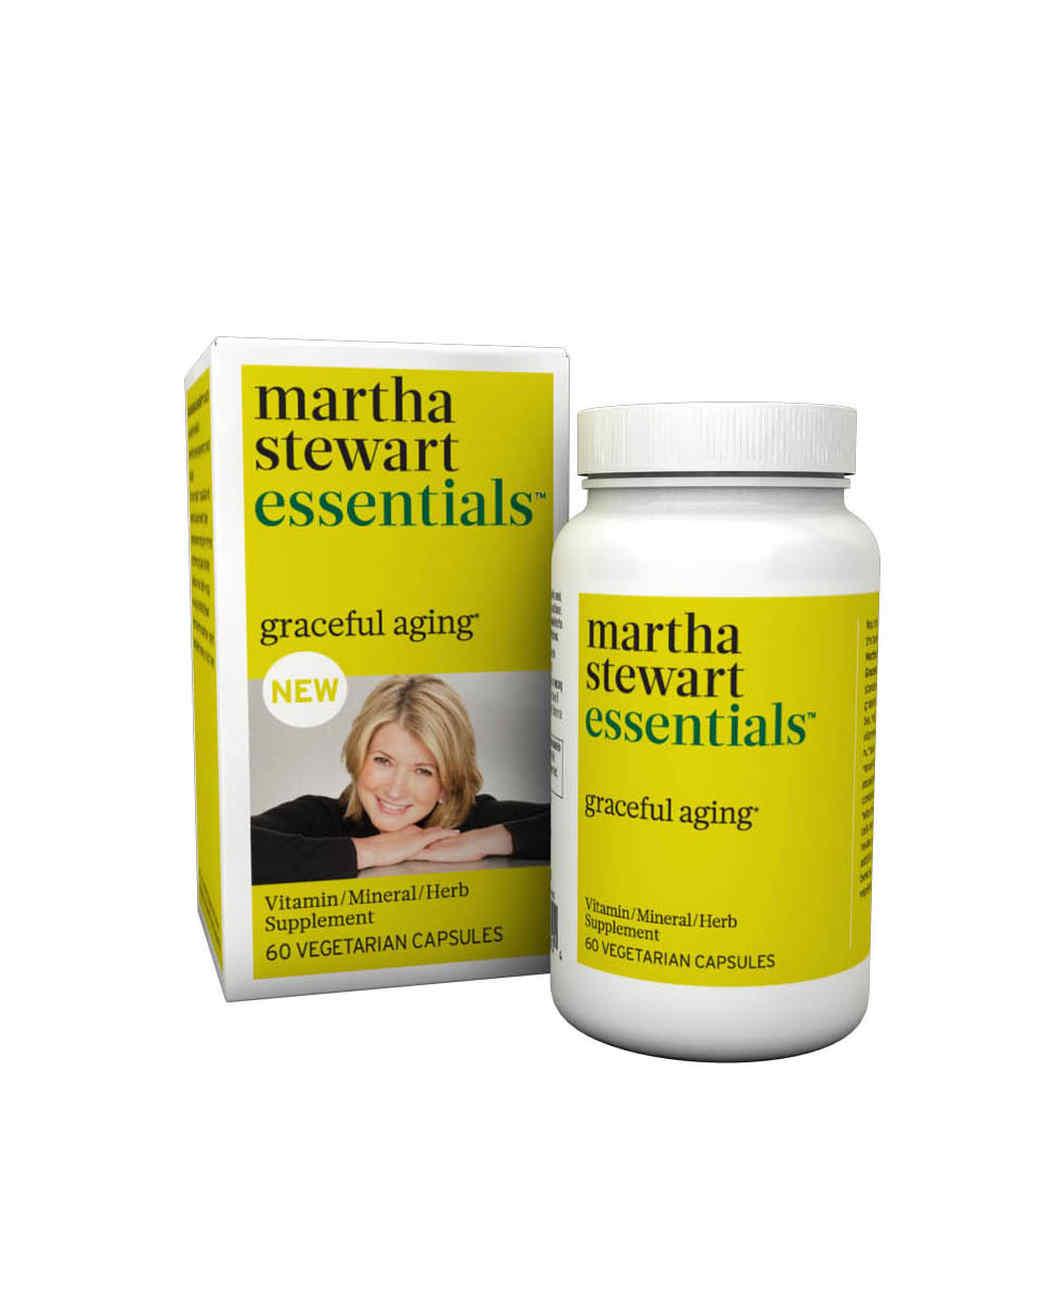 essentials-anti-aging-mrkt-0314.jpg